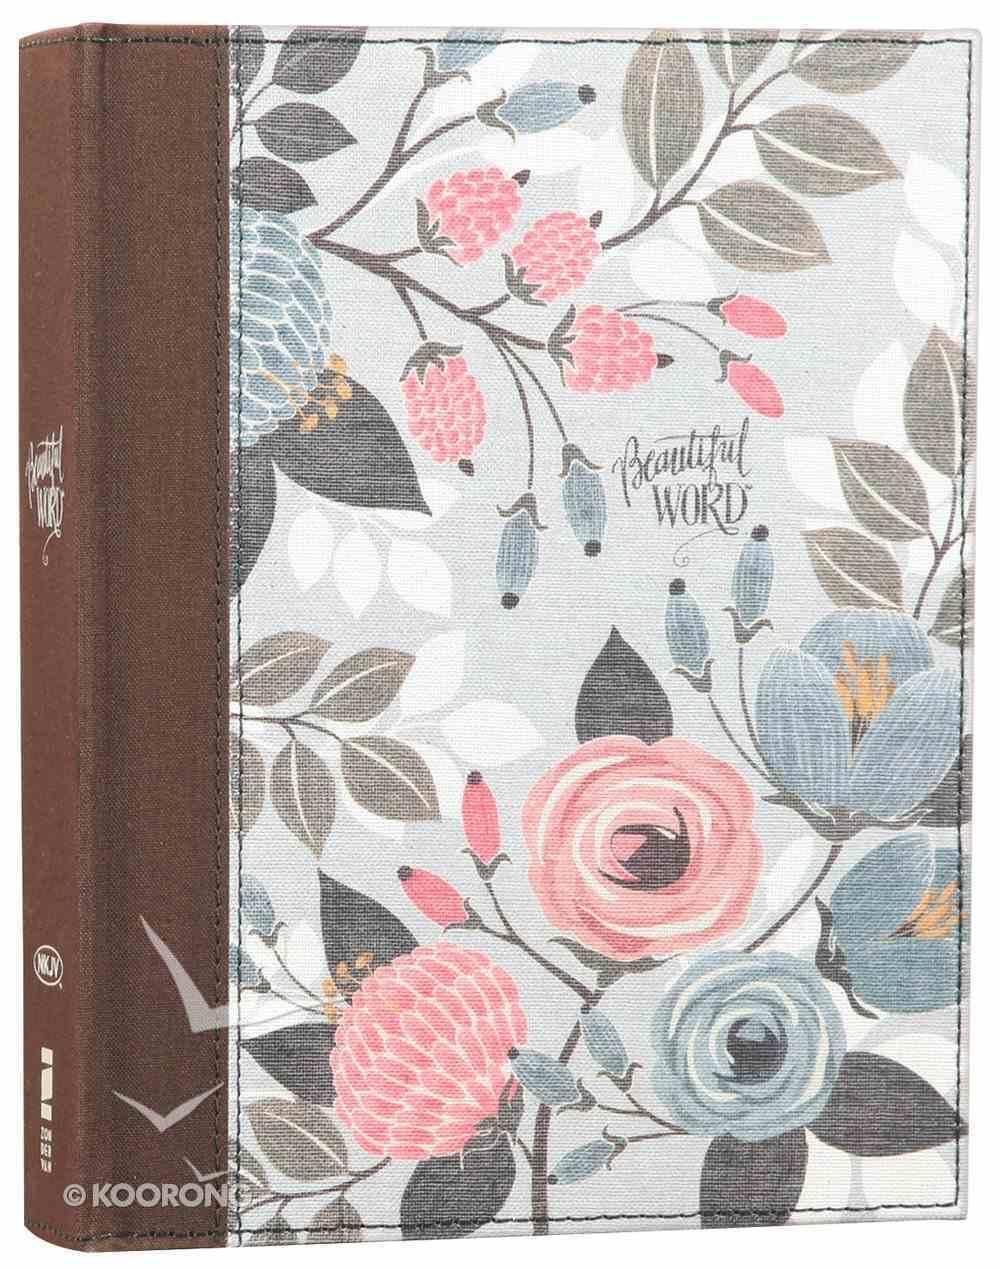 NKJV Beautiful Word Bible Floral (Red Letter Edition) Hardback